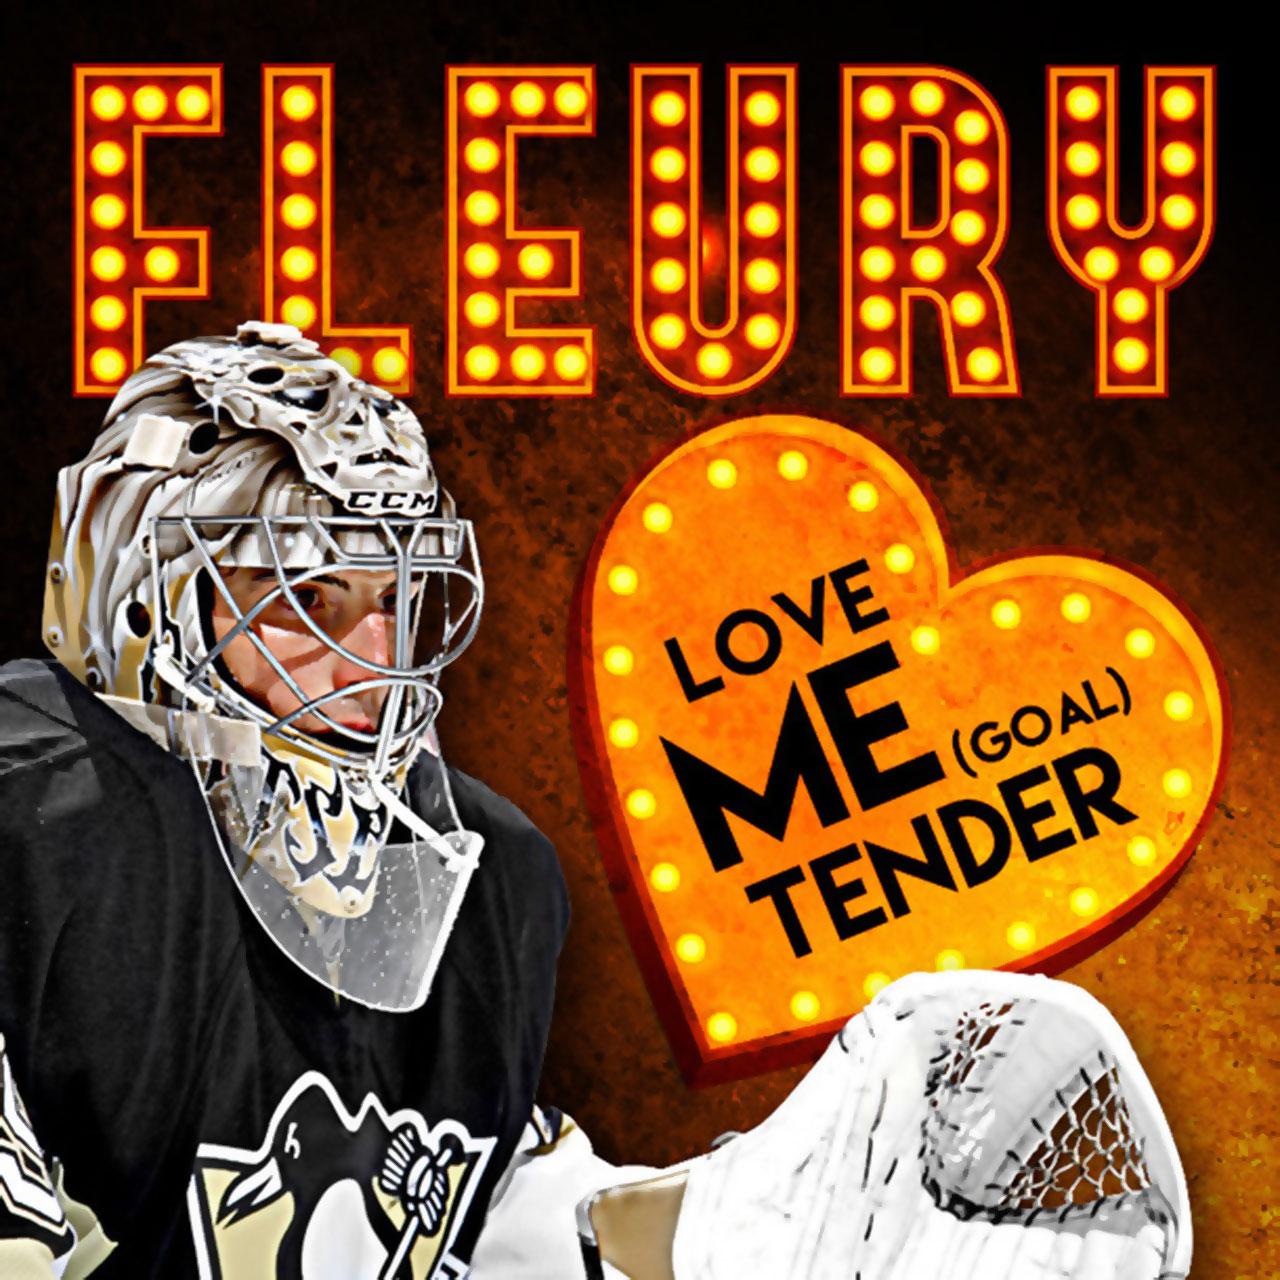 Penguins Flyers and Blackhawks serve up mushy Valentines – Mushy Valentine Cards